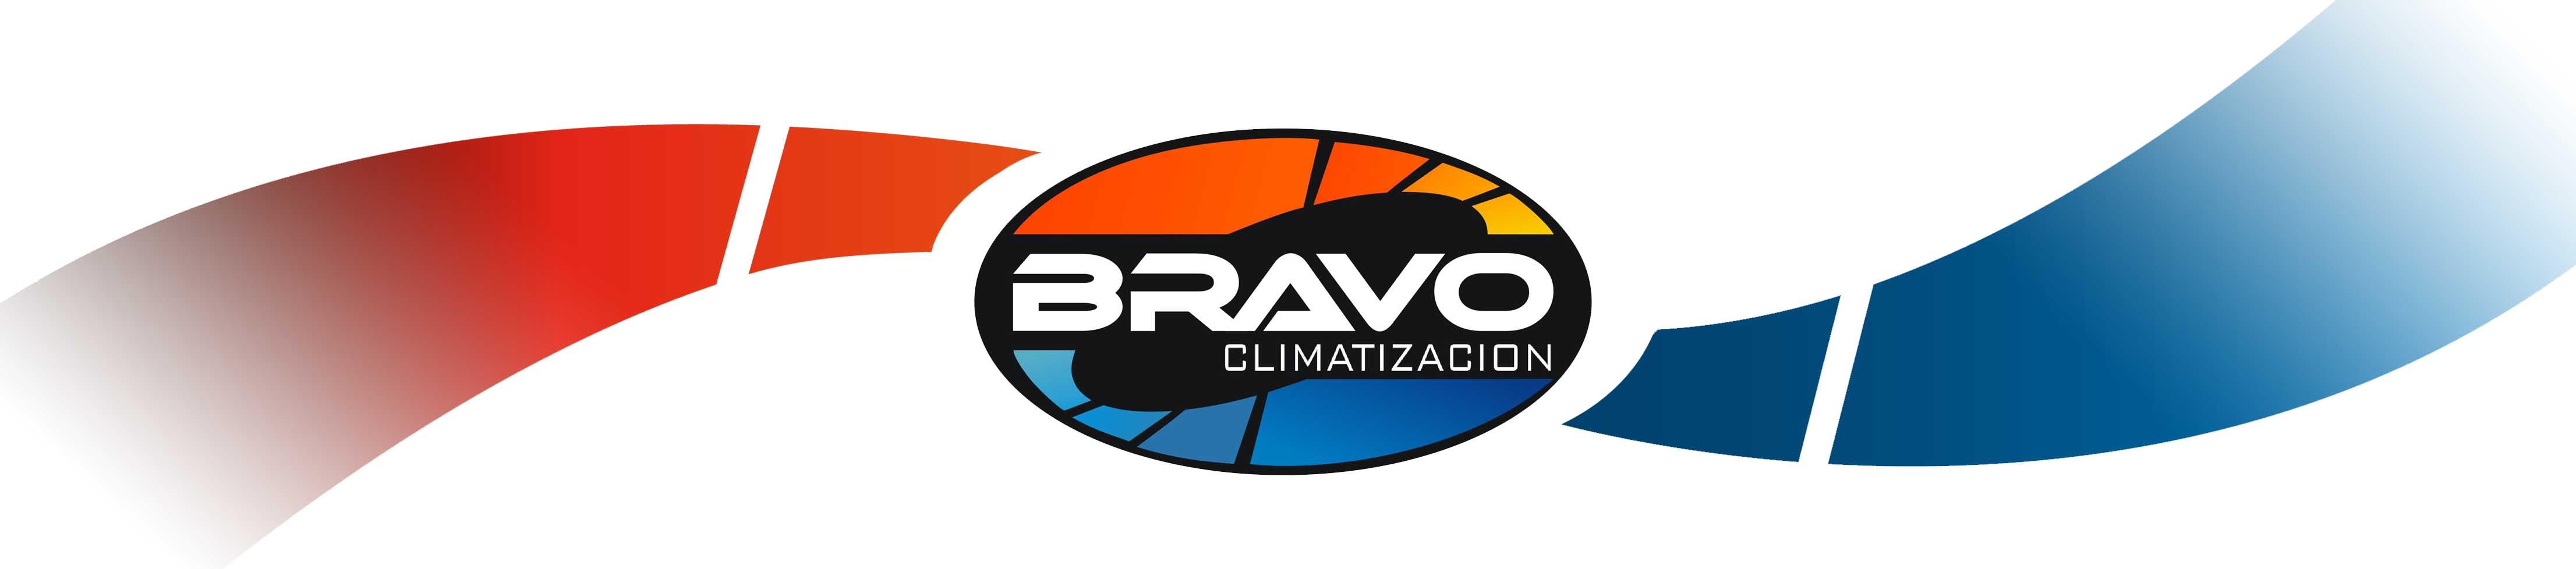 Bravo climatizacion Logo